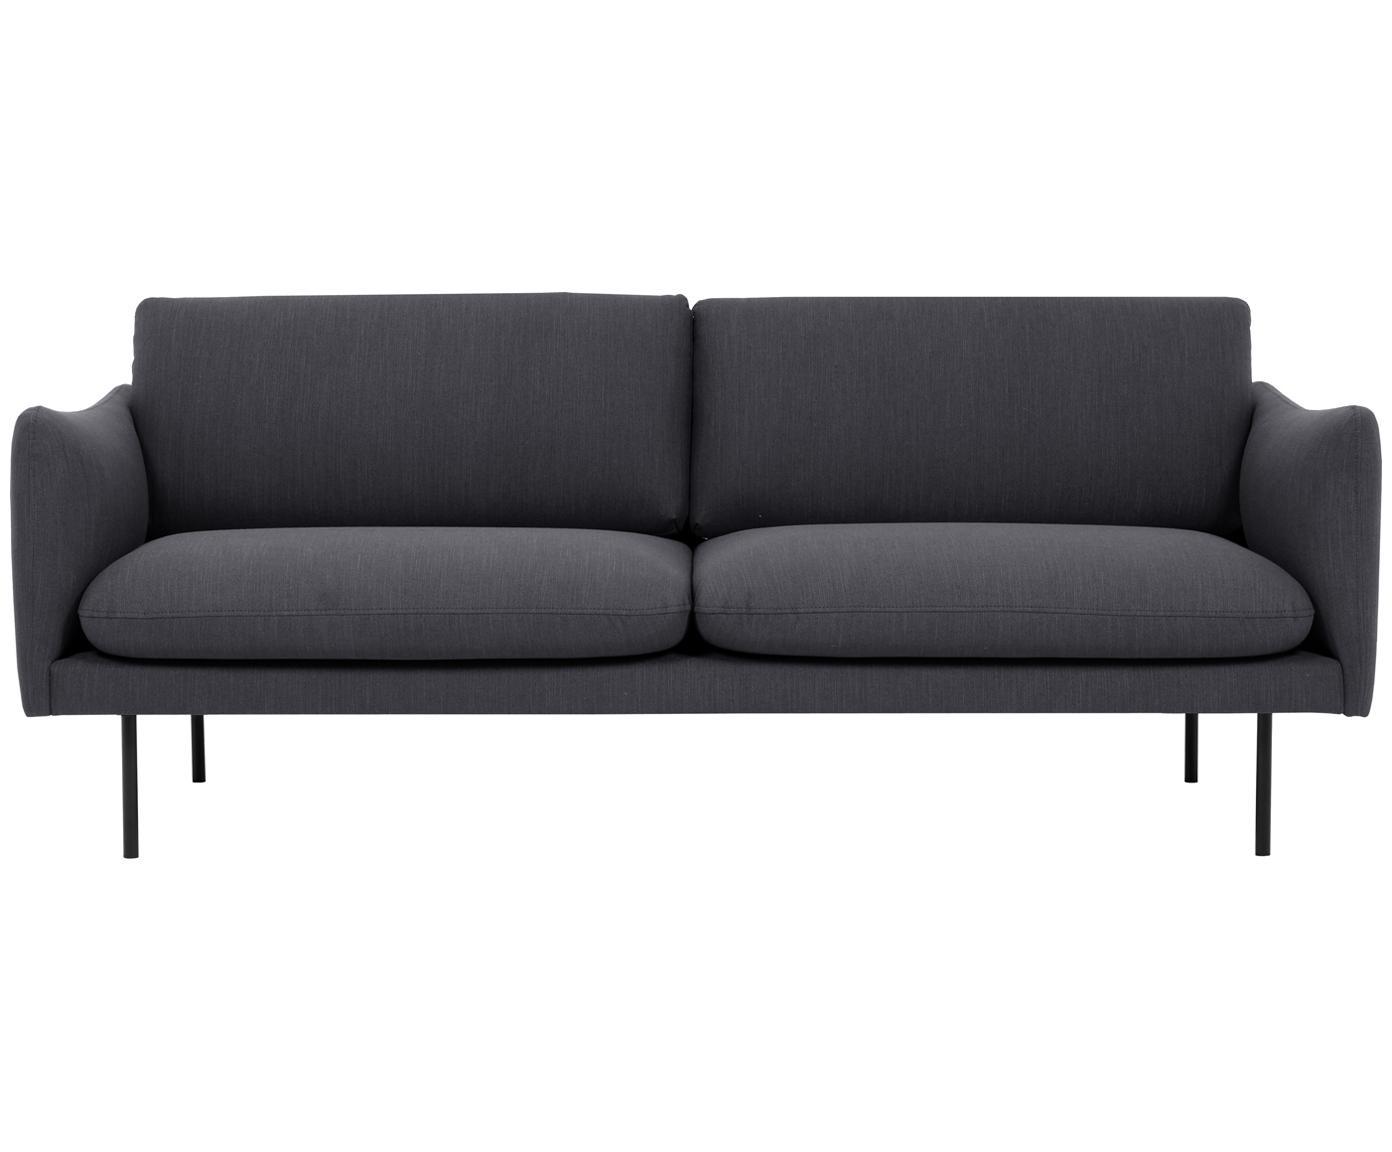 Sofa Moby (2-Sitzer), Bezug: Polyester 60.000 Scheuert, Gestell: Massives Kiefernholz, Webstoff Dunkelgrau, B 170 x T 95 cm